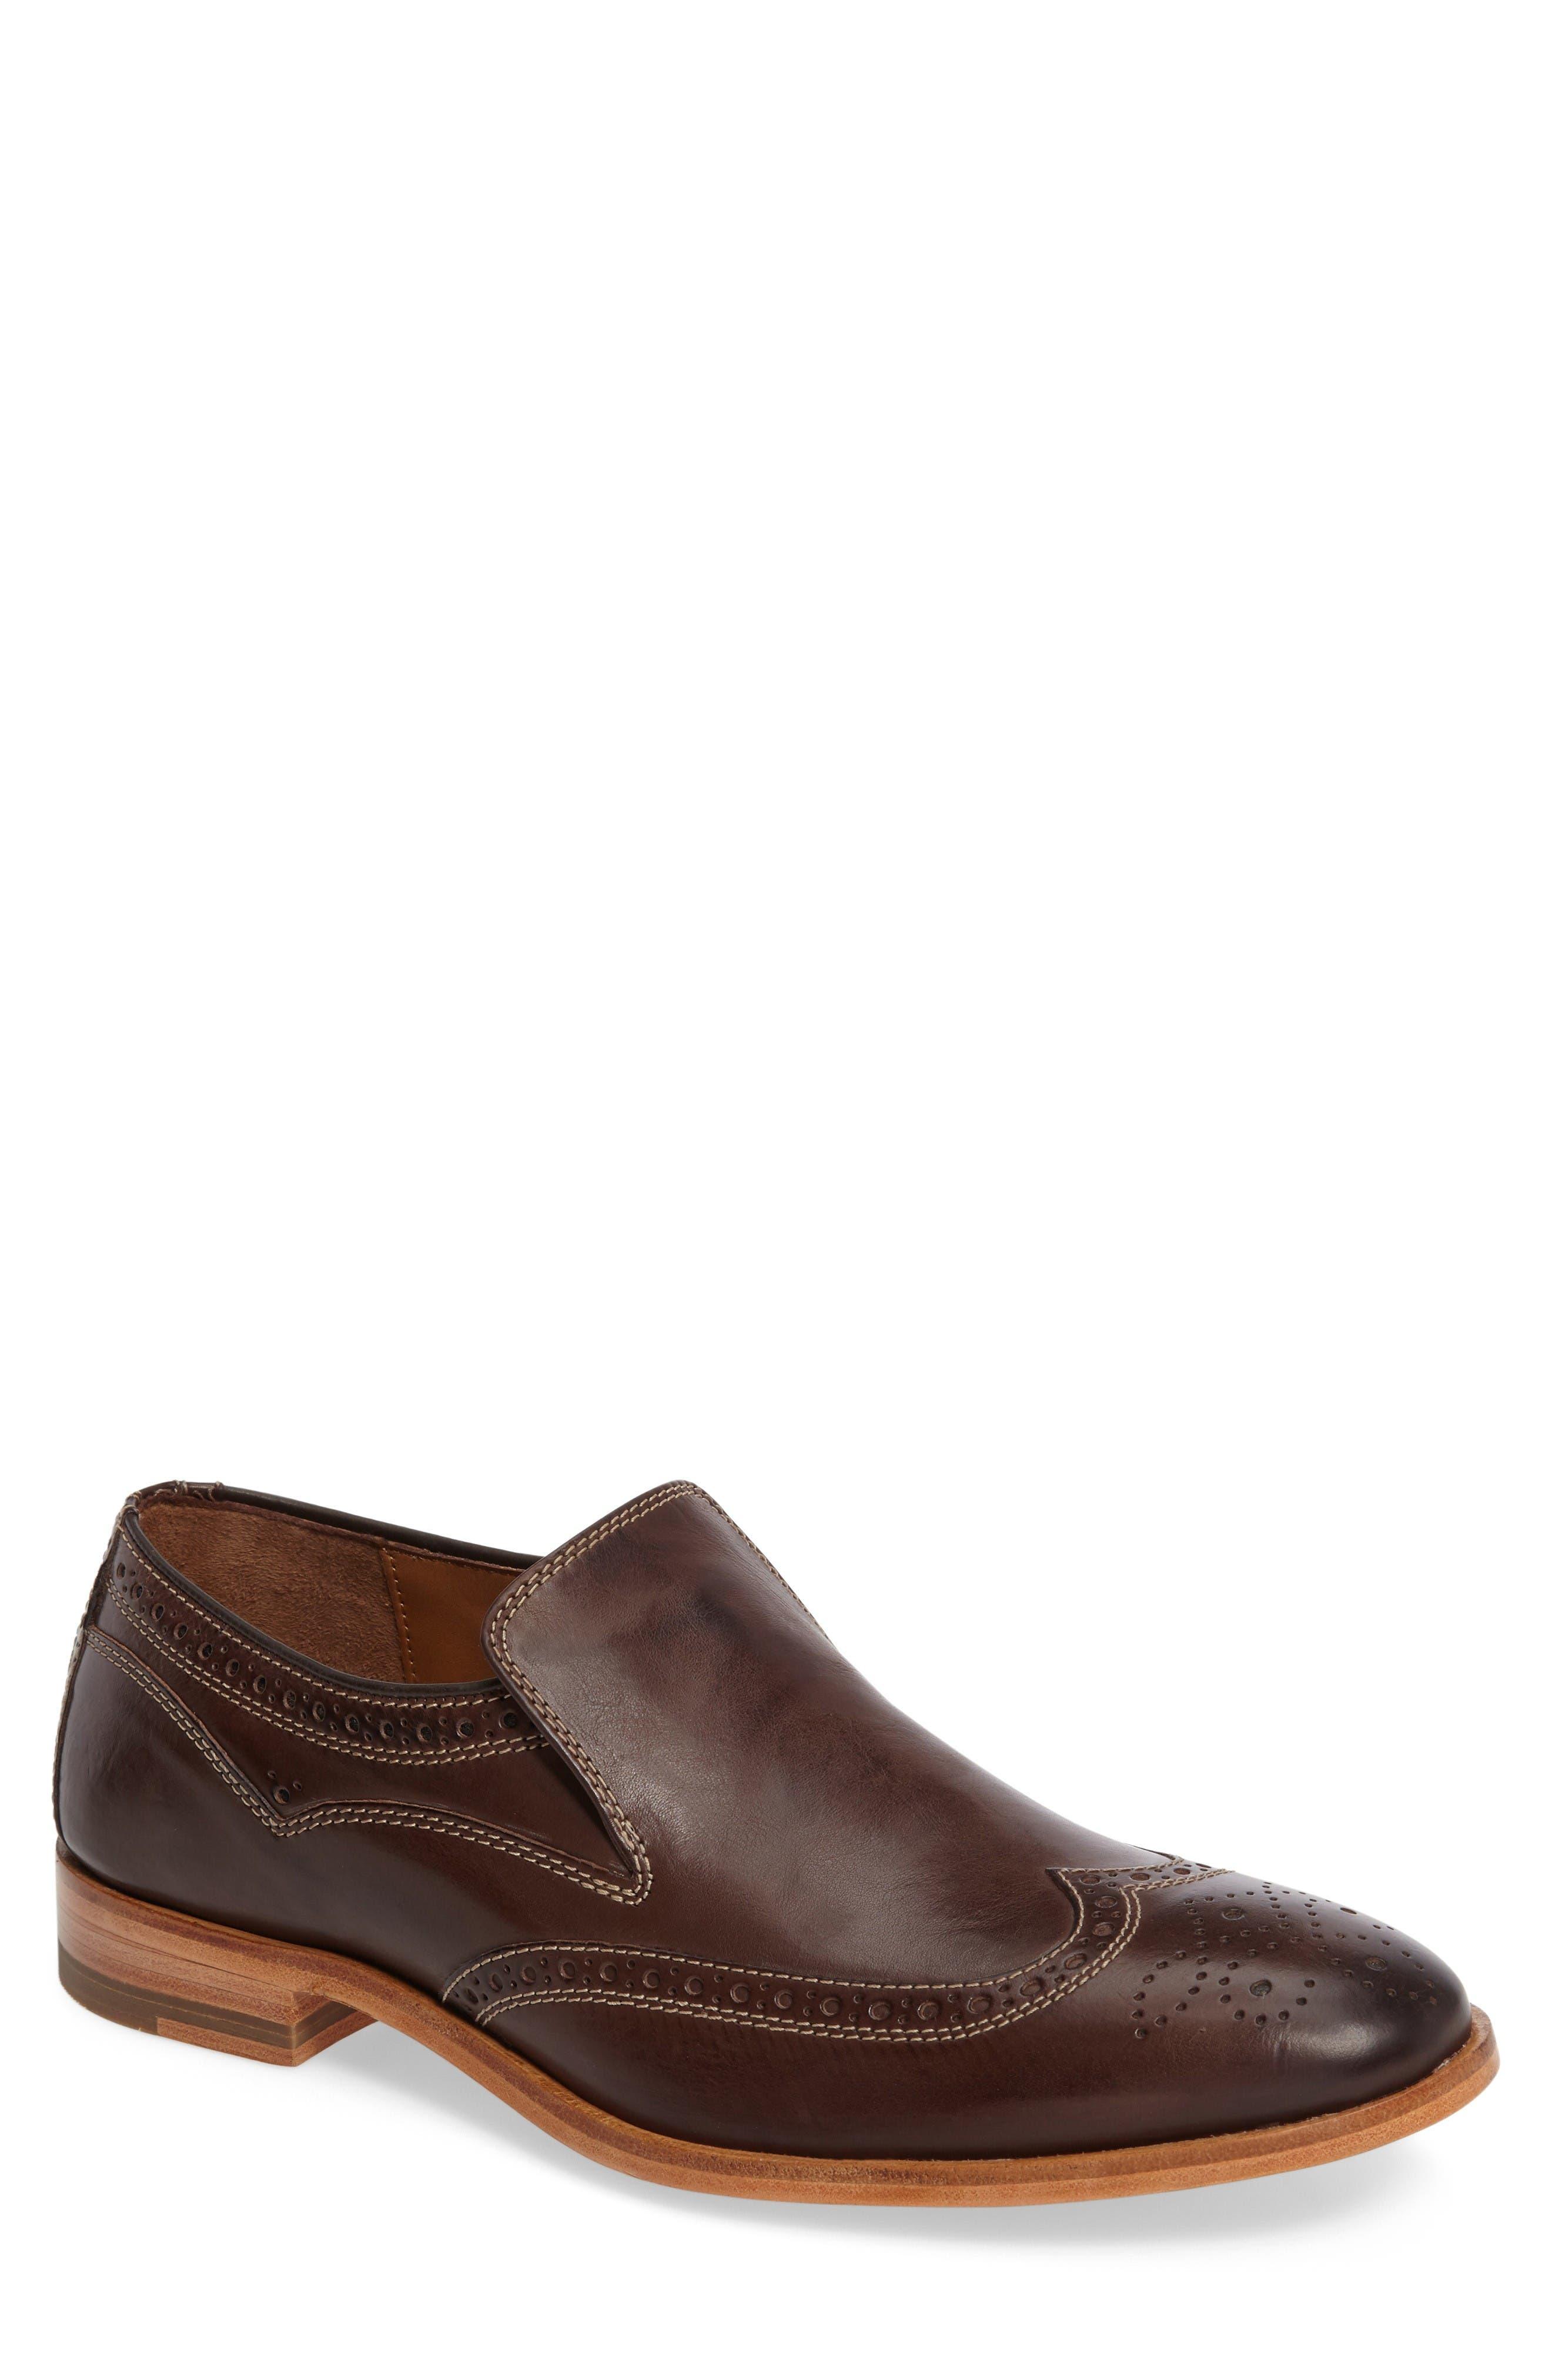 Graham Wingtip Loafer,                             Main thumbnail 1, color,                             Dark Brown Calfskin Leather